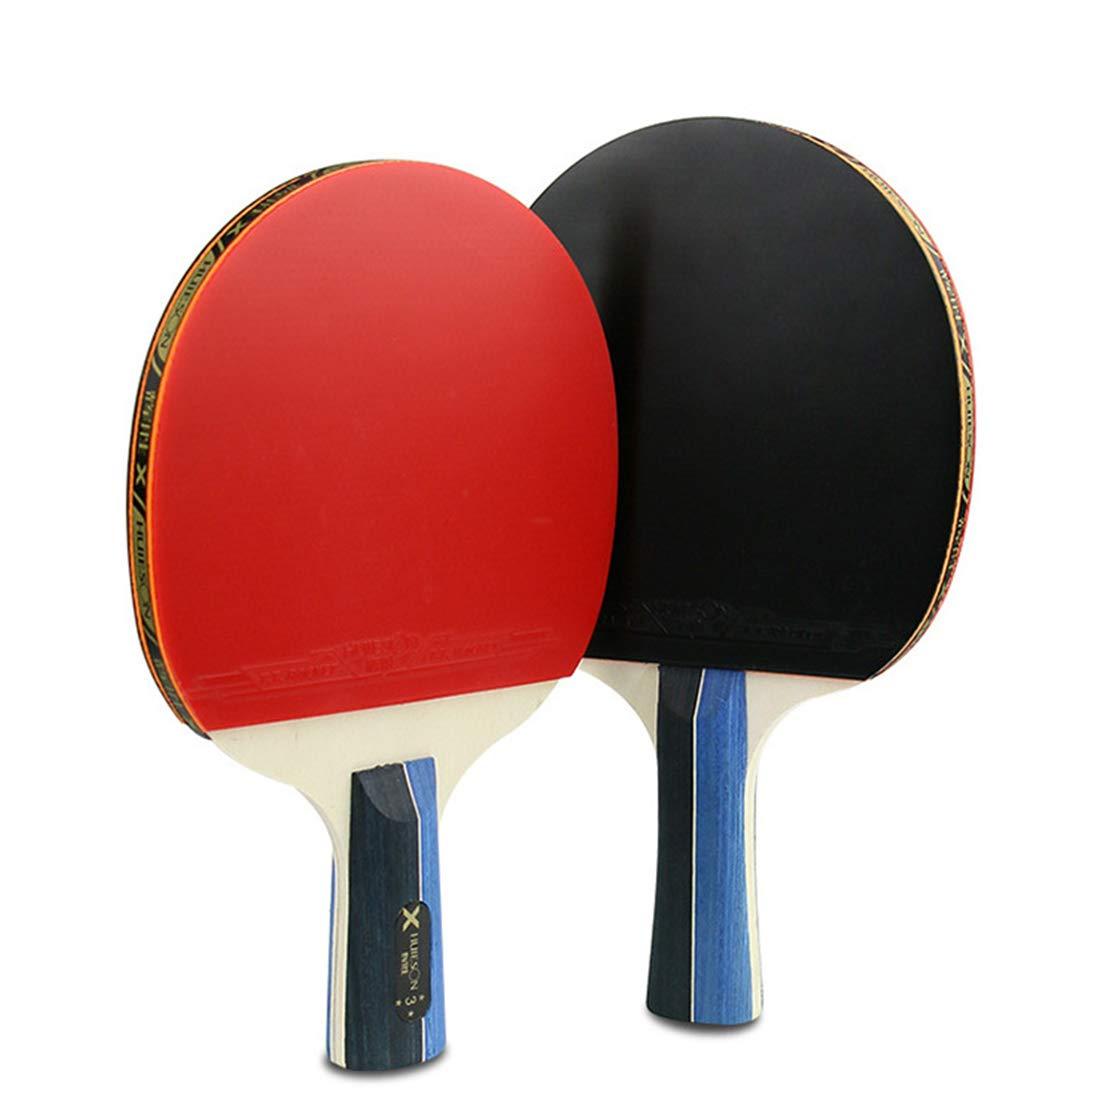 YUYAXQP PortátilPala Ping Pong, Pala De Tenis De Mesa De Funda ...